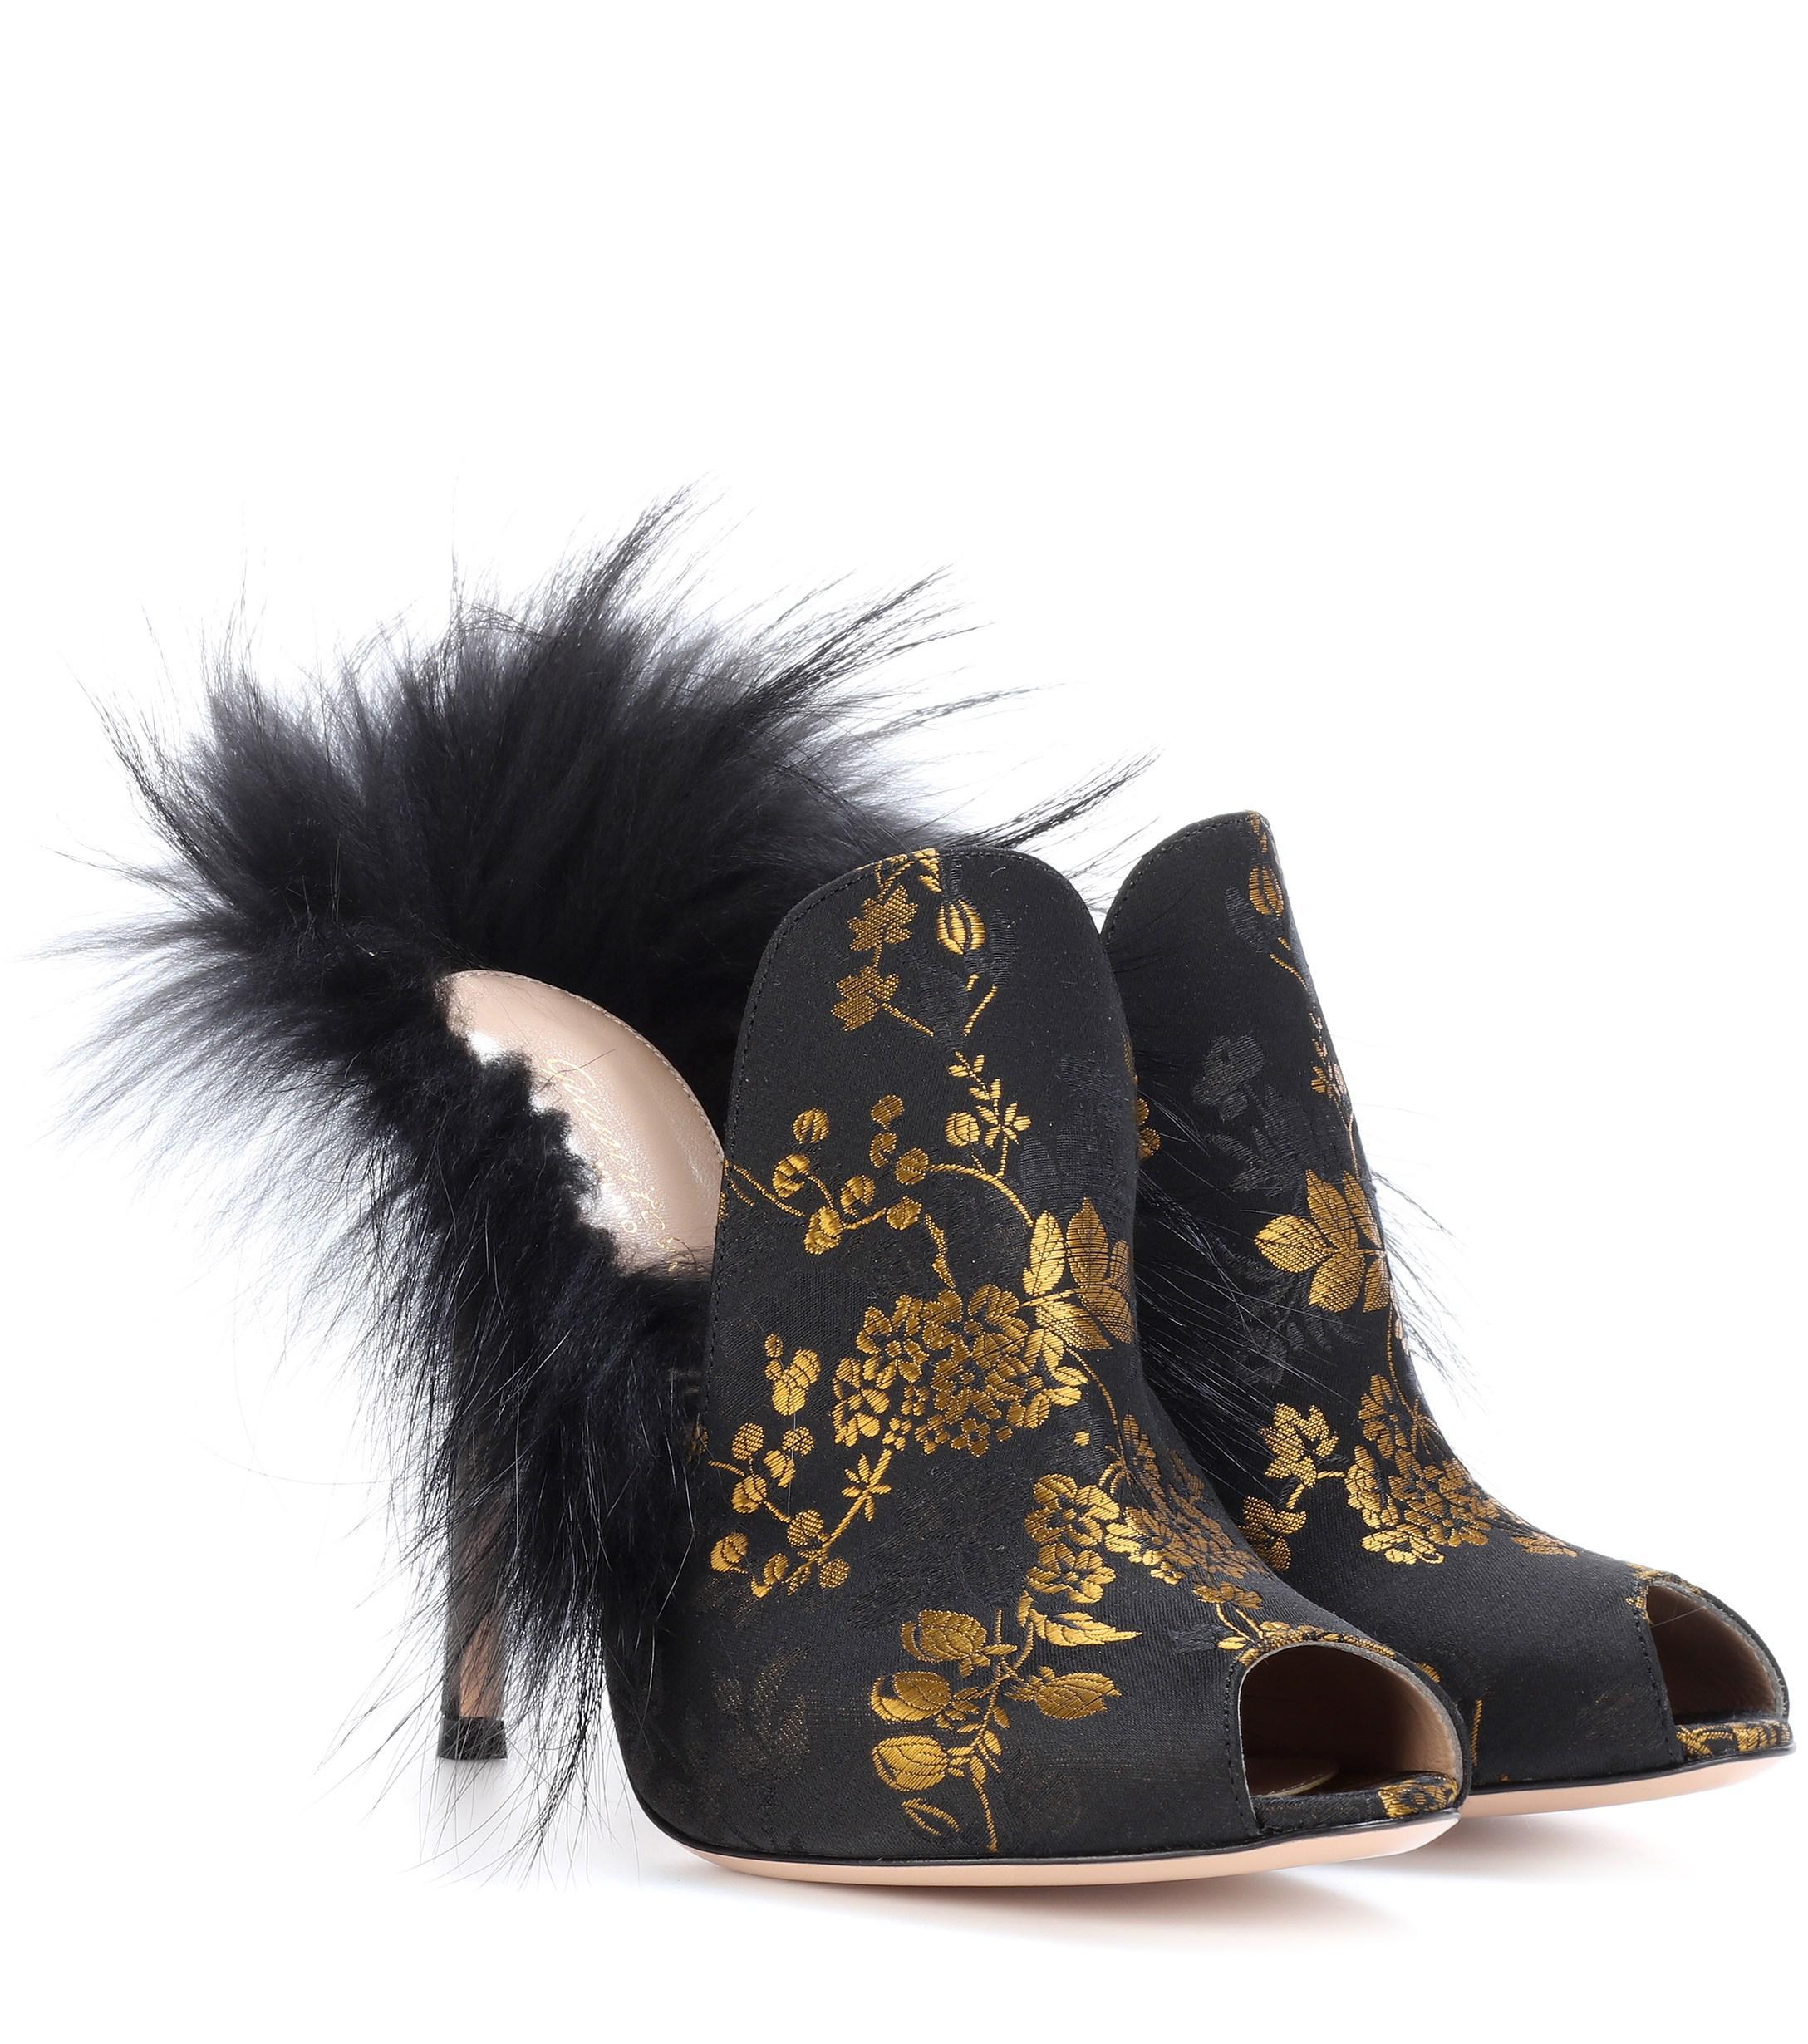 de96674f69d Lyst - Gianvito Rossi Fur-lined Brocade Mules in Black